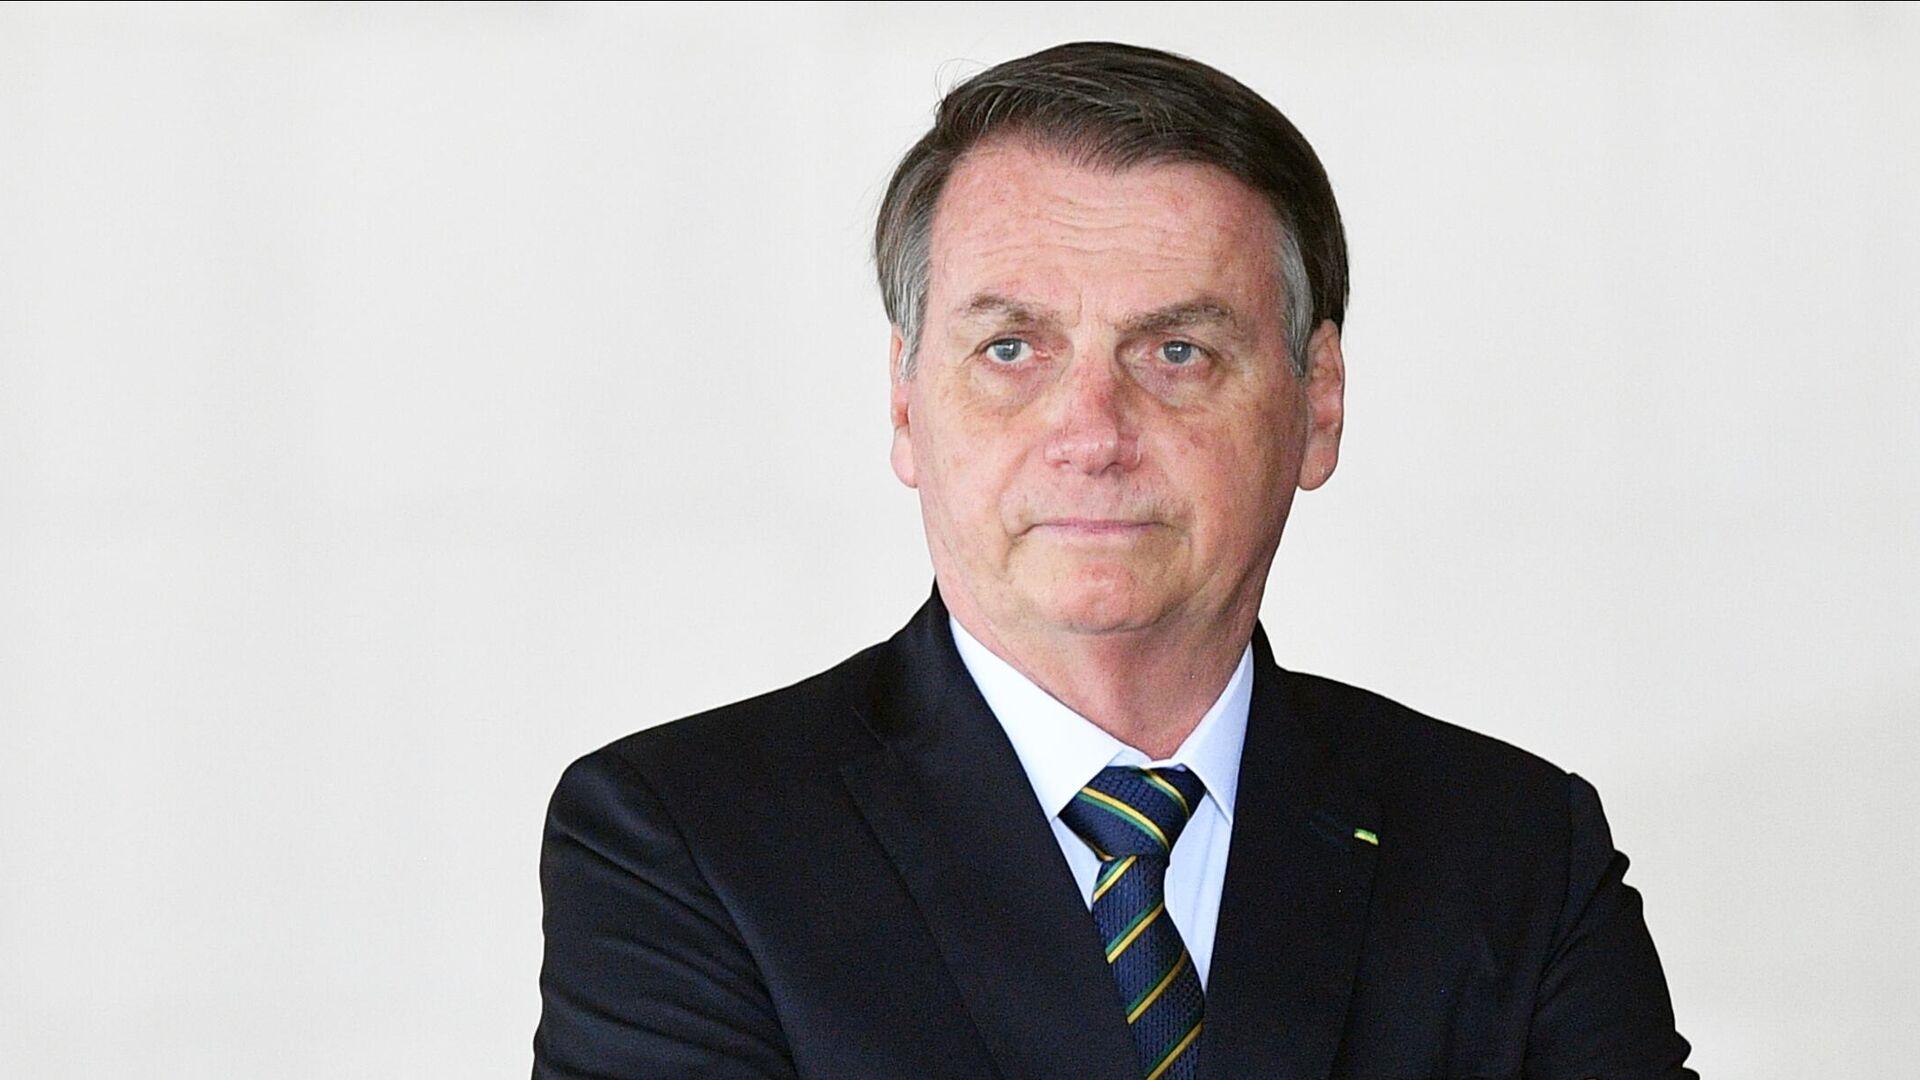 Президент Бразилии Жаир Болсонару - РИА Новости, 1920, 21.09.2021